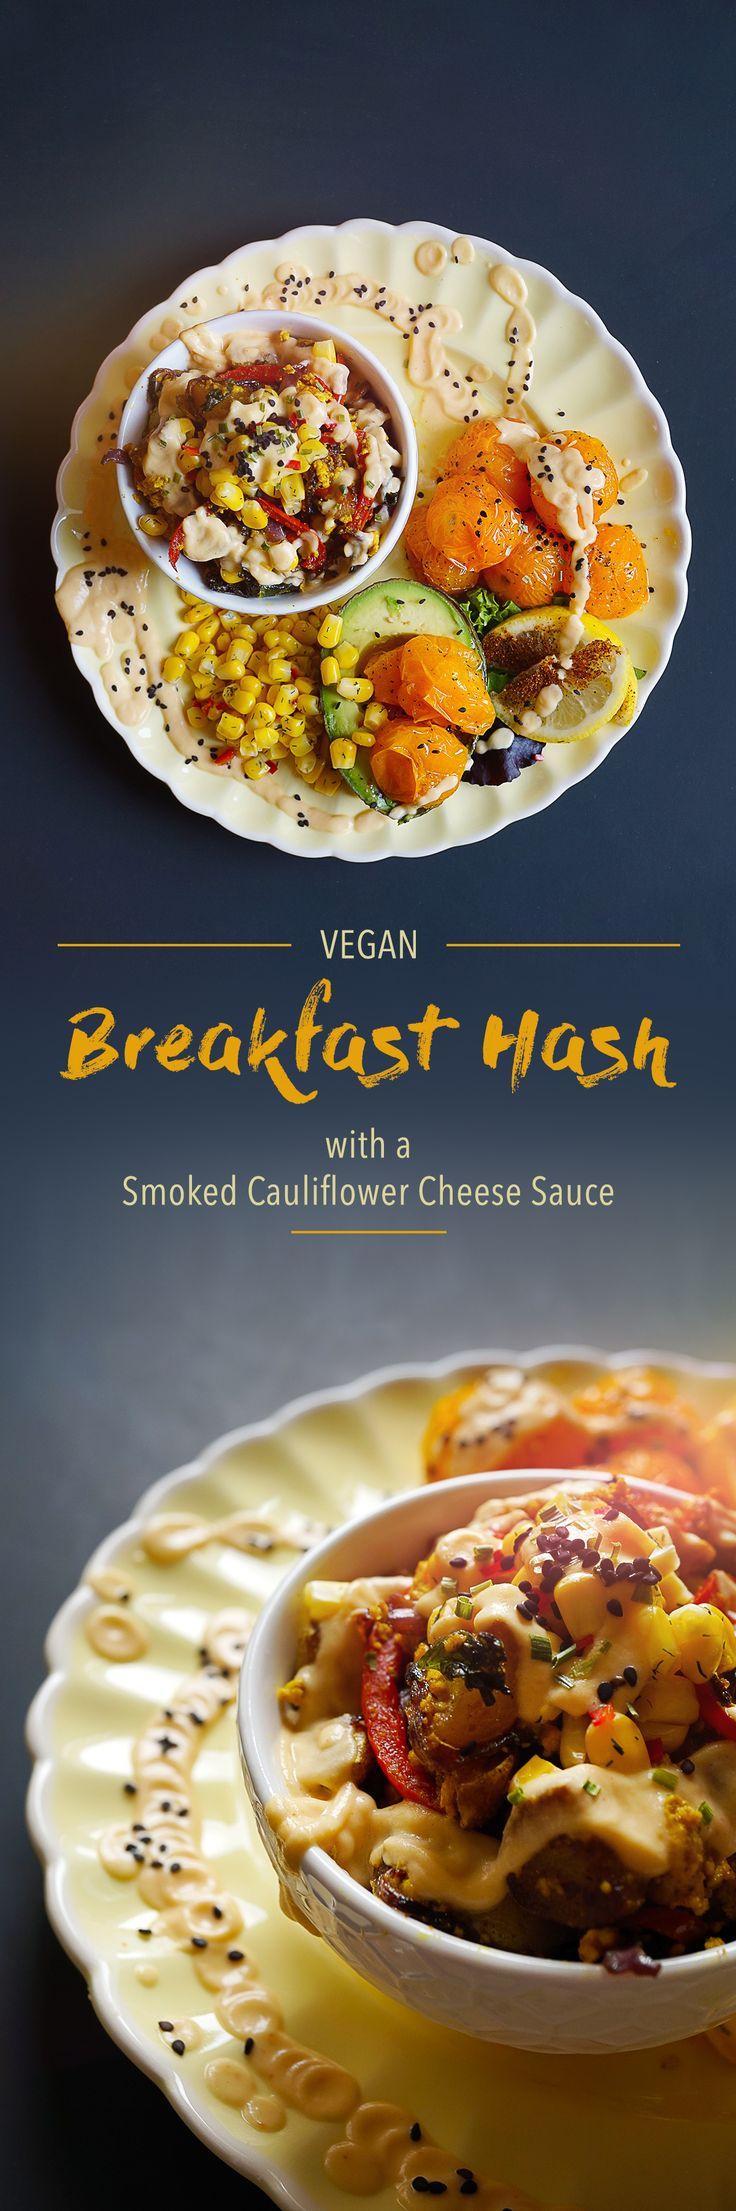 Breakfast Hash with a Smoked Cauliflower Cheese Sauce